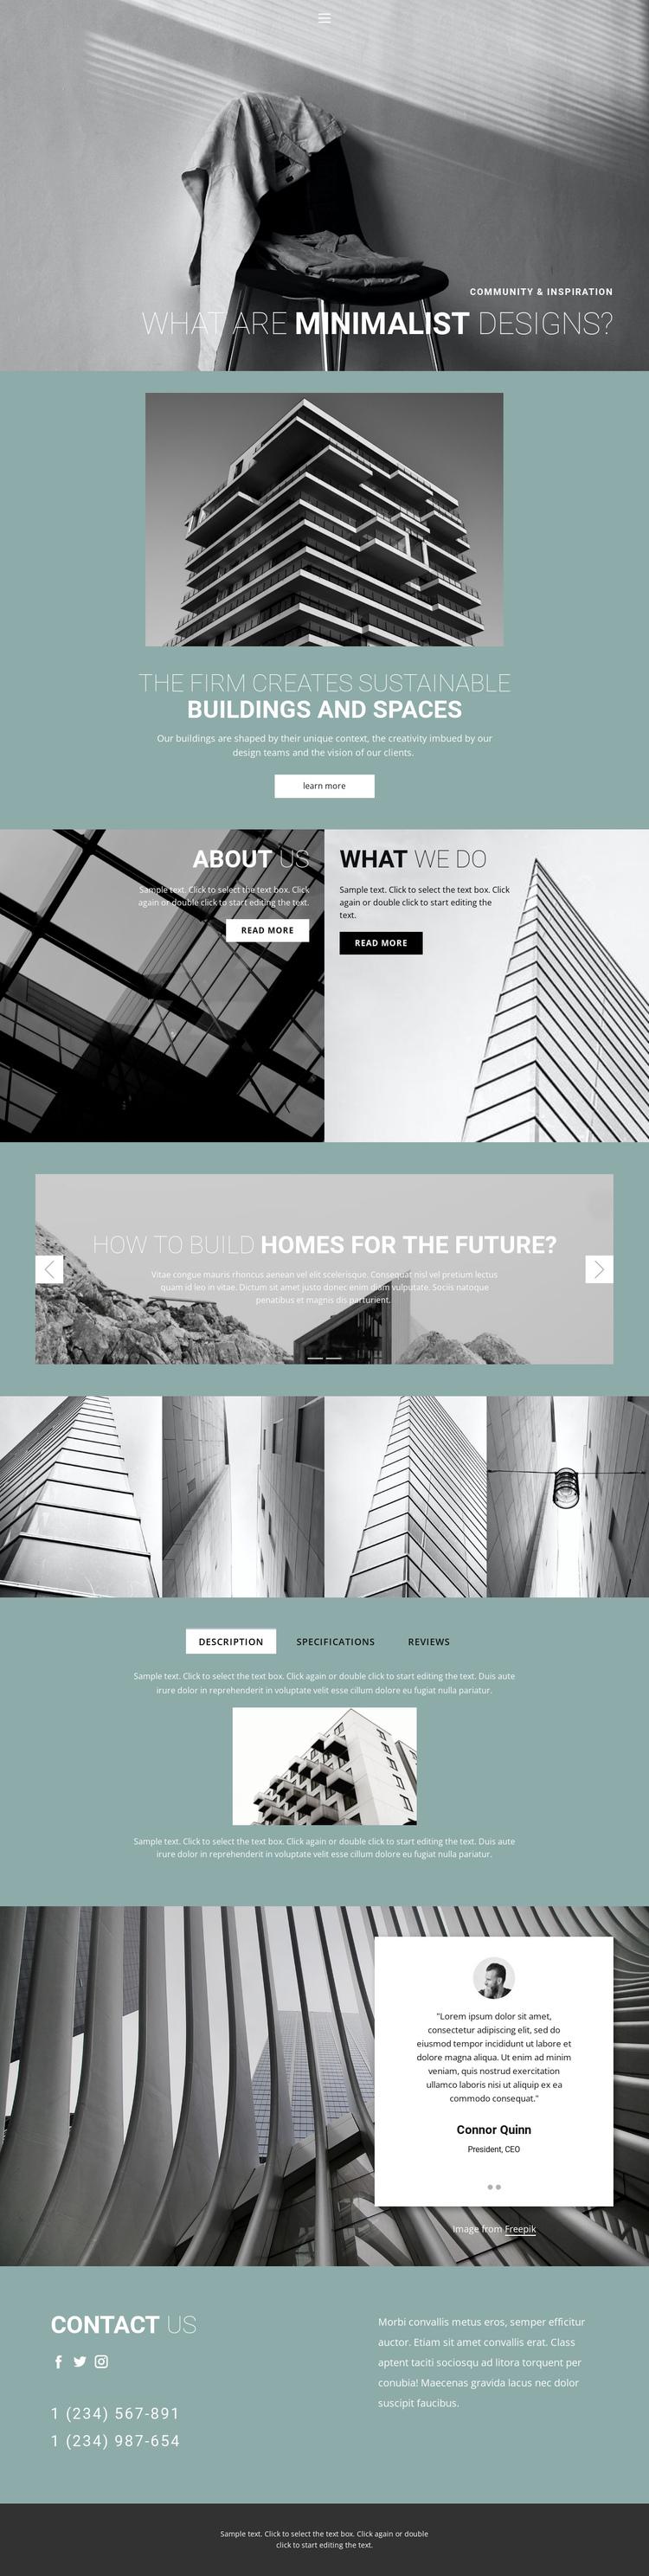 Perfect architecture ideas Website Builder Software